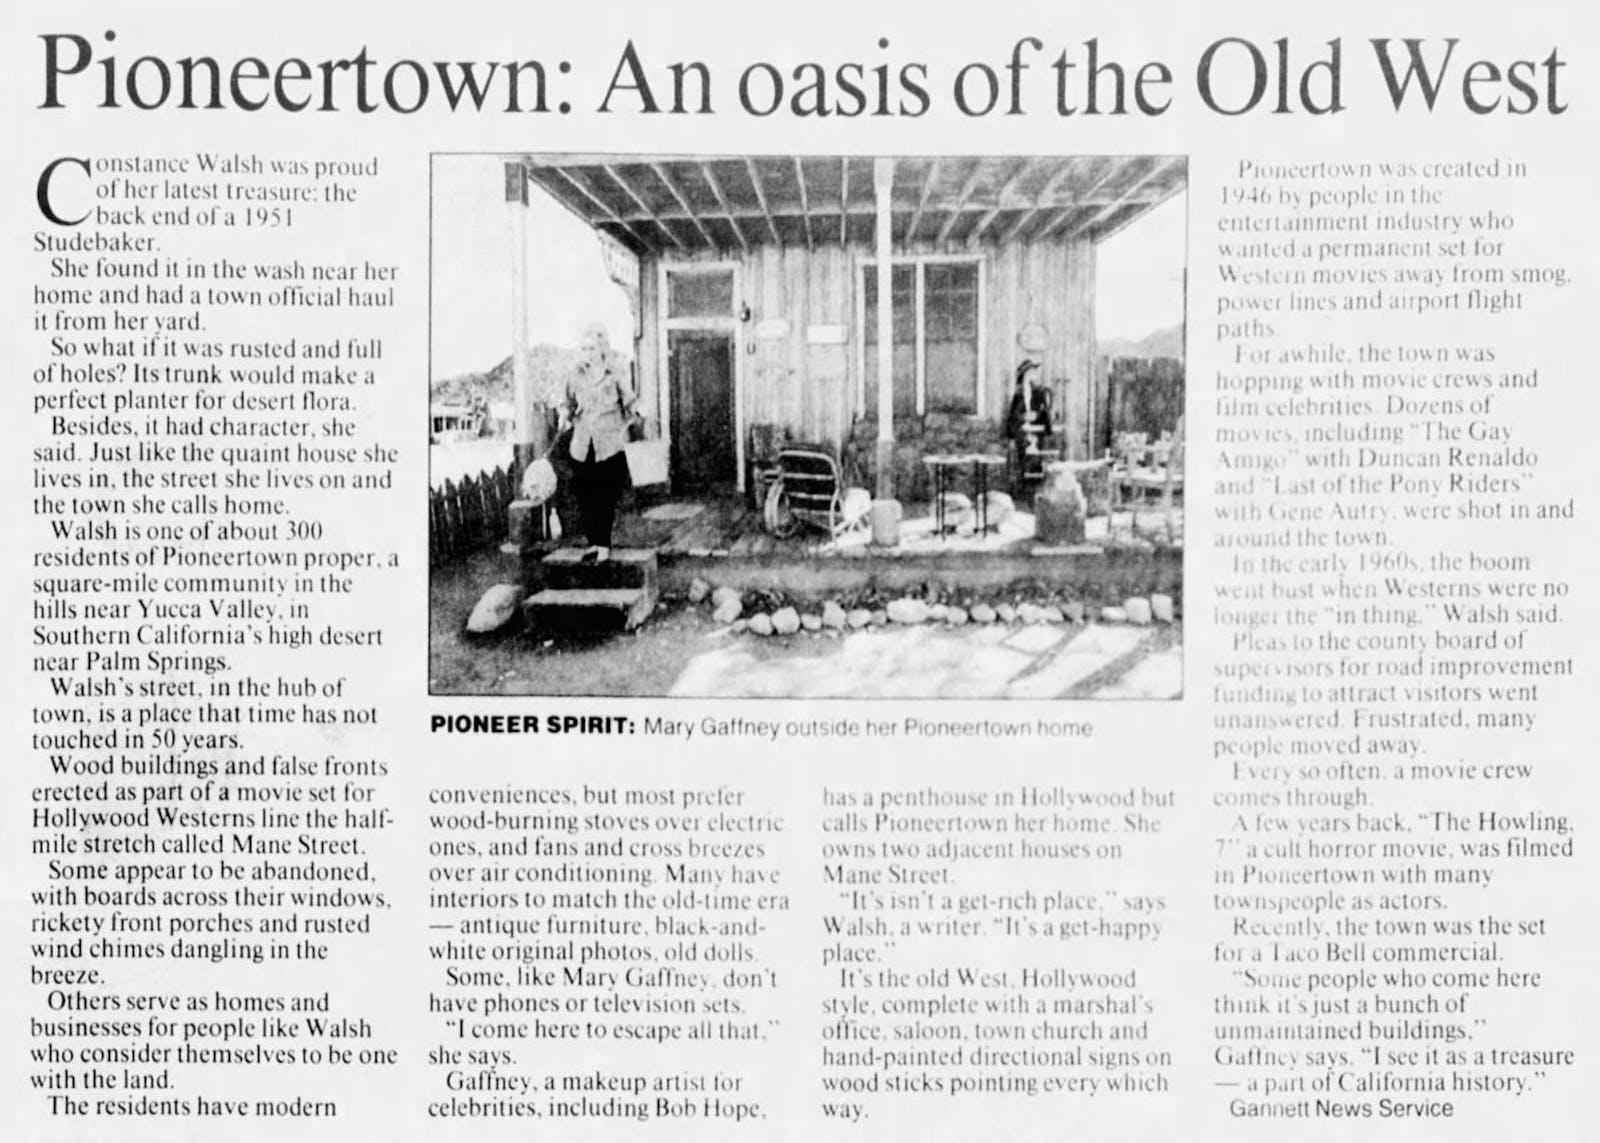 Dec. 8, 1996 - Reno Gazette Journal article clipping